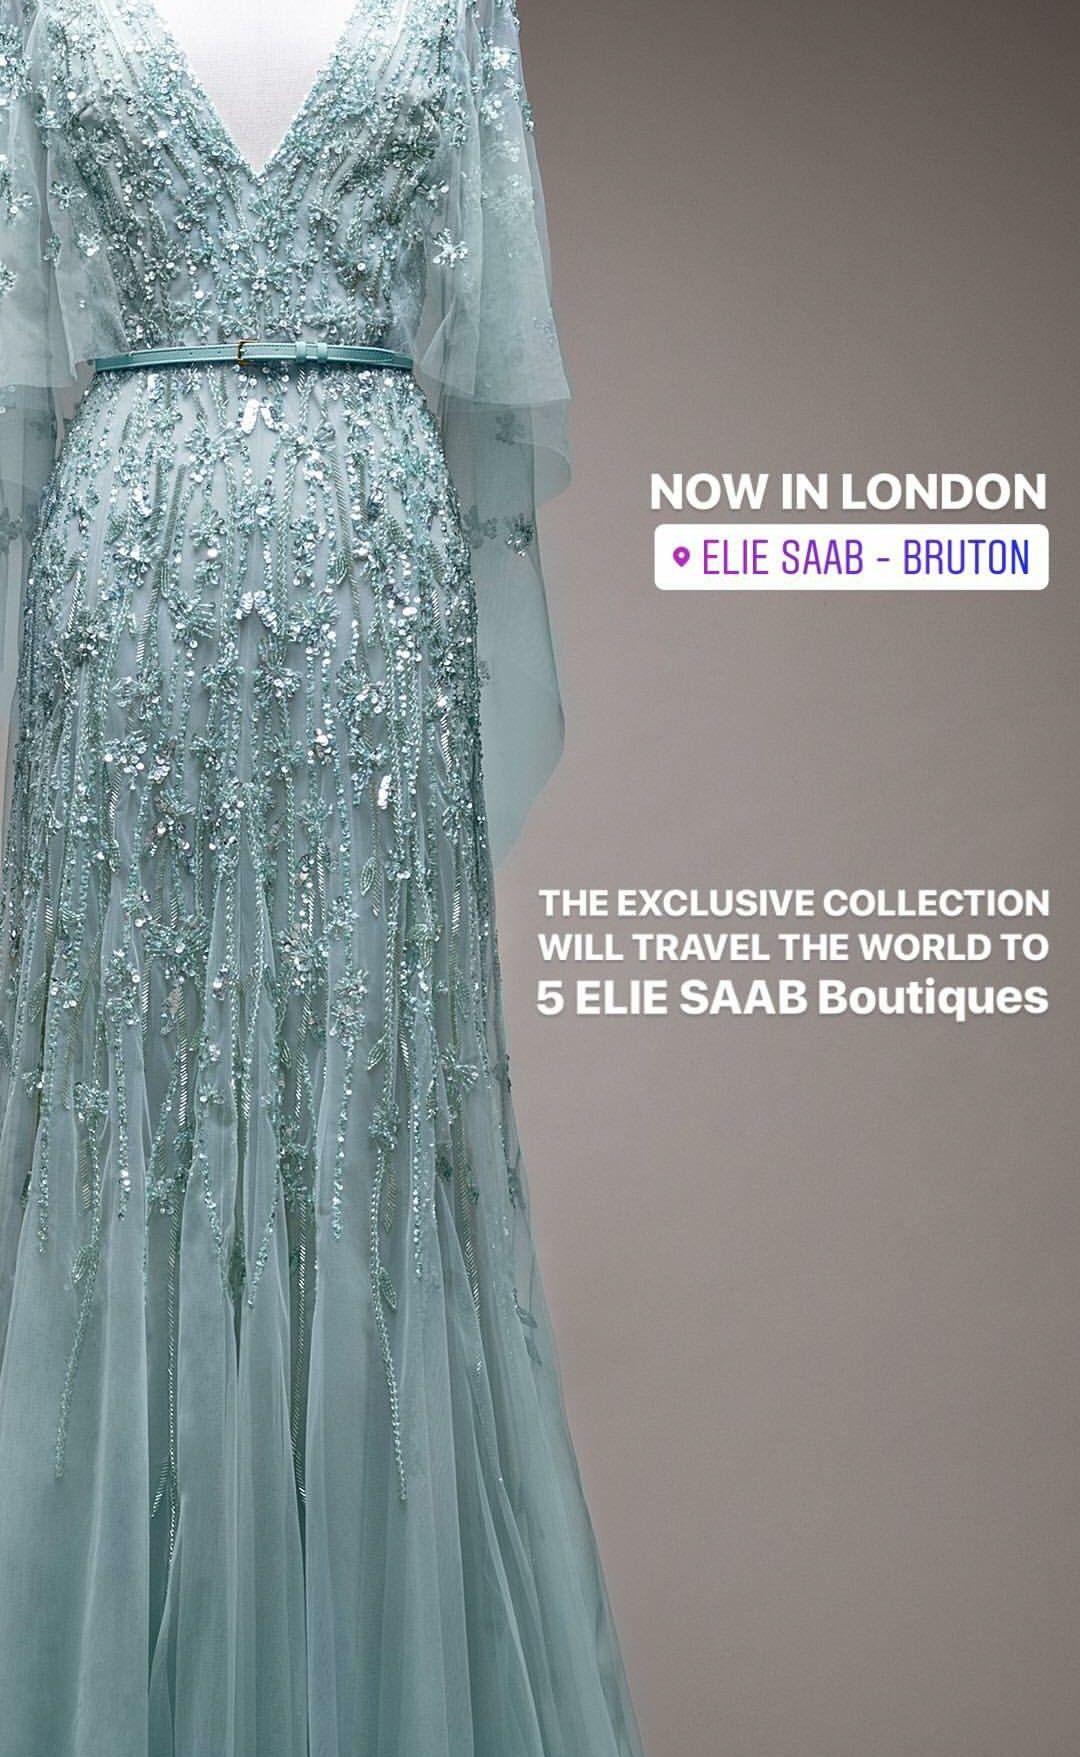 Pin by Özl73 on Kıyafet seçenekleri | Pinterest | Muslim gown, Gowns ...